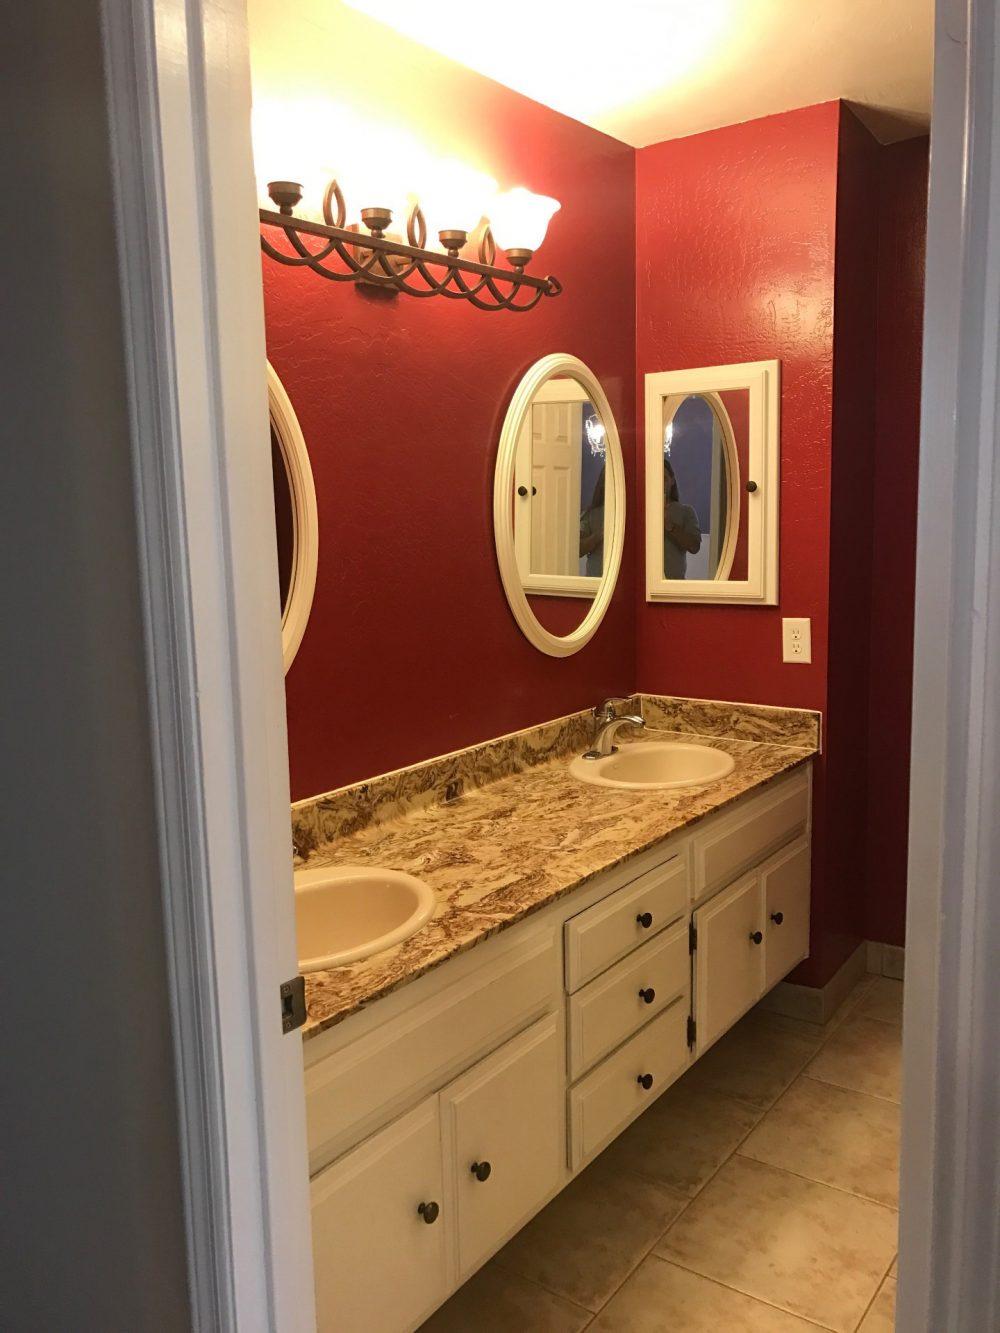 Hall bath pic 1